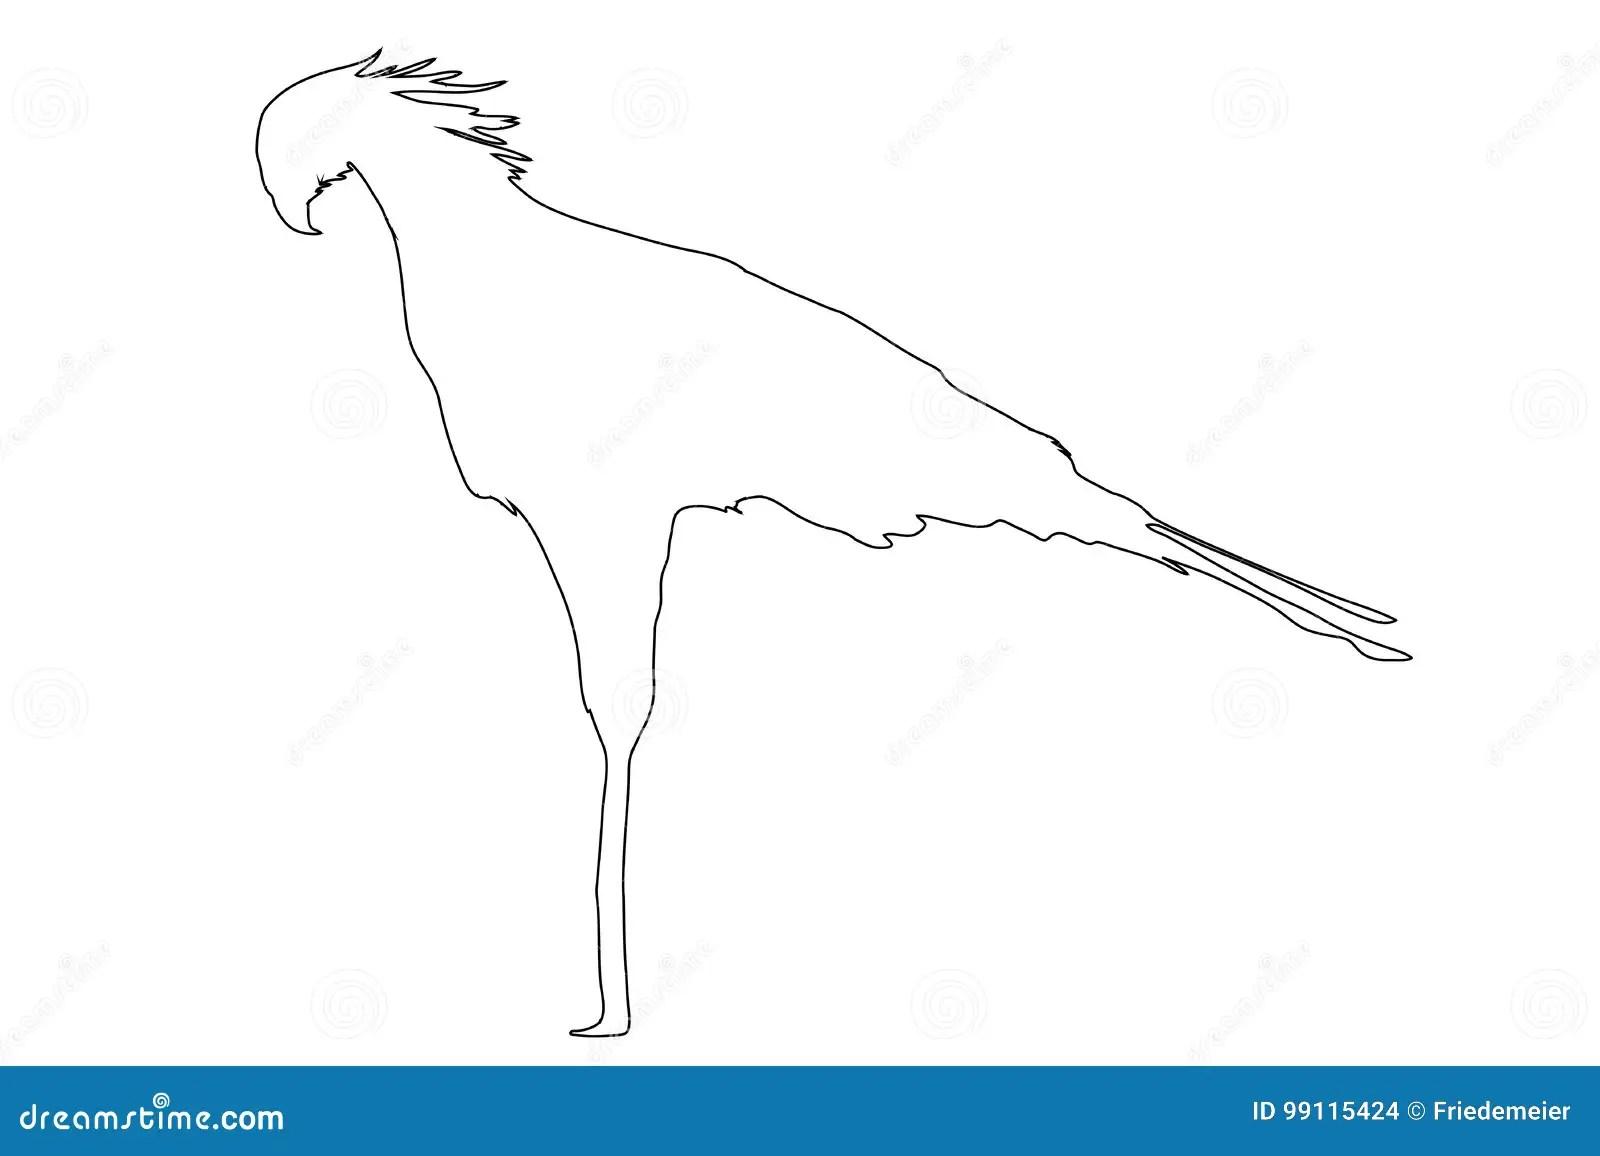 Outline Of An African Secretary Bird Stock Vector